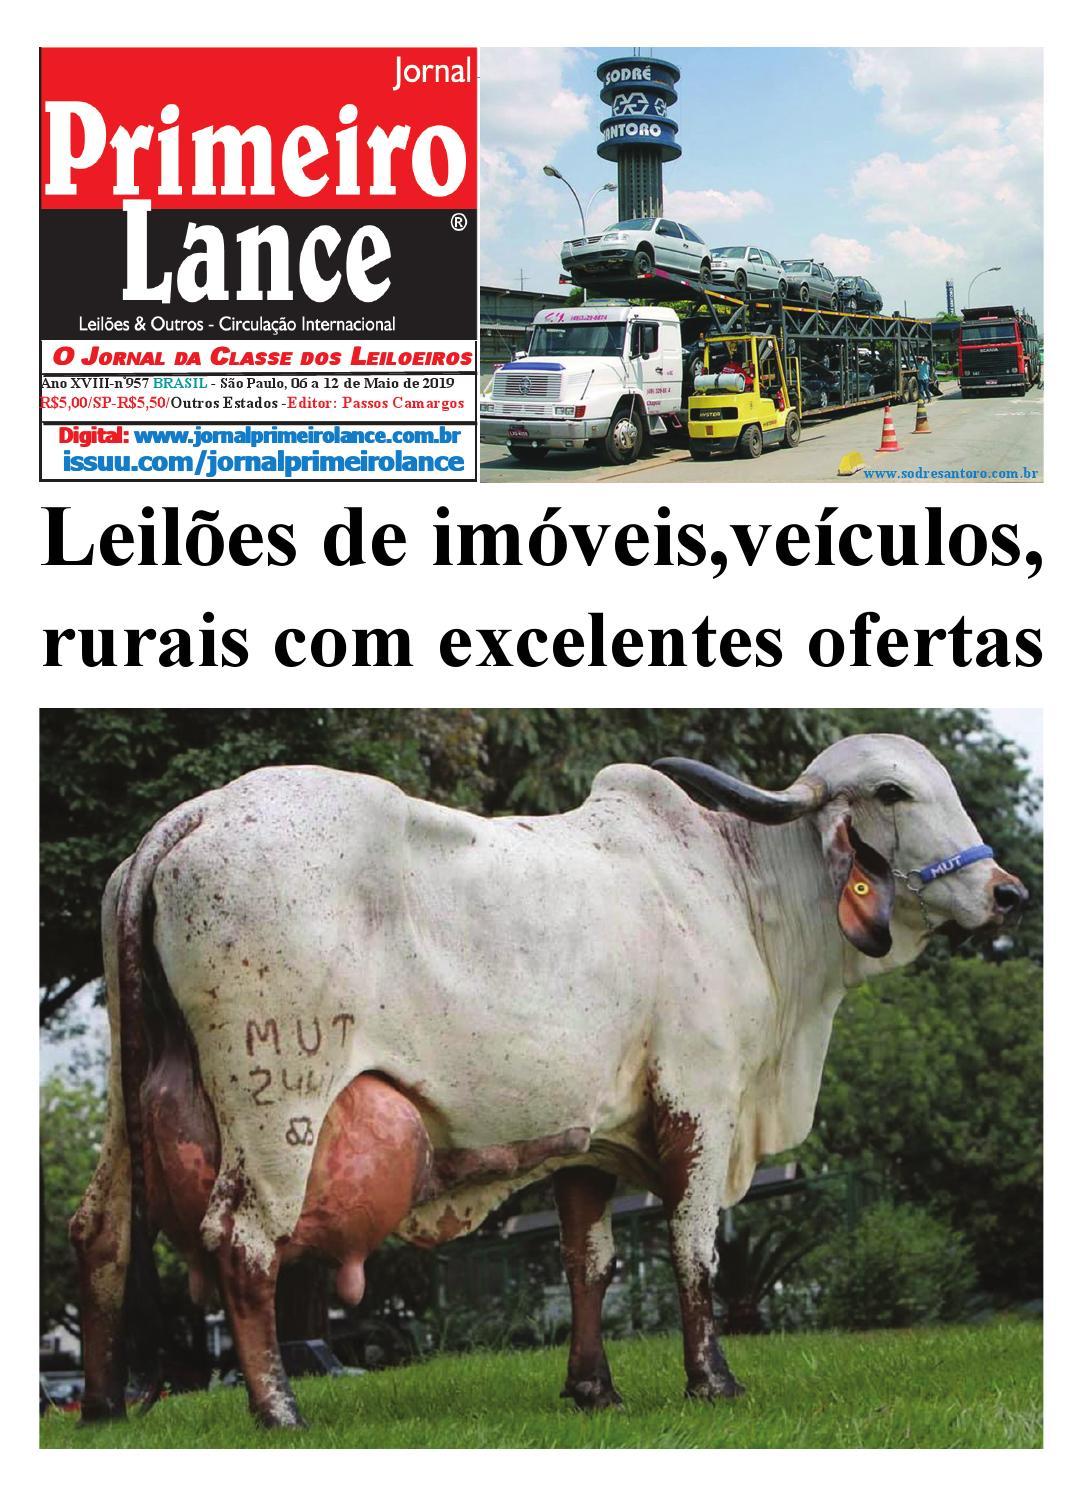 8dbfee281 jornal Primeiro Lance by Jornal Primeiro Lance - issuu